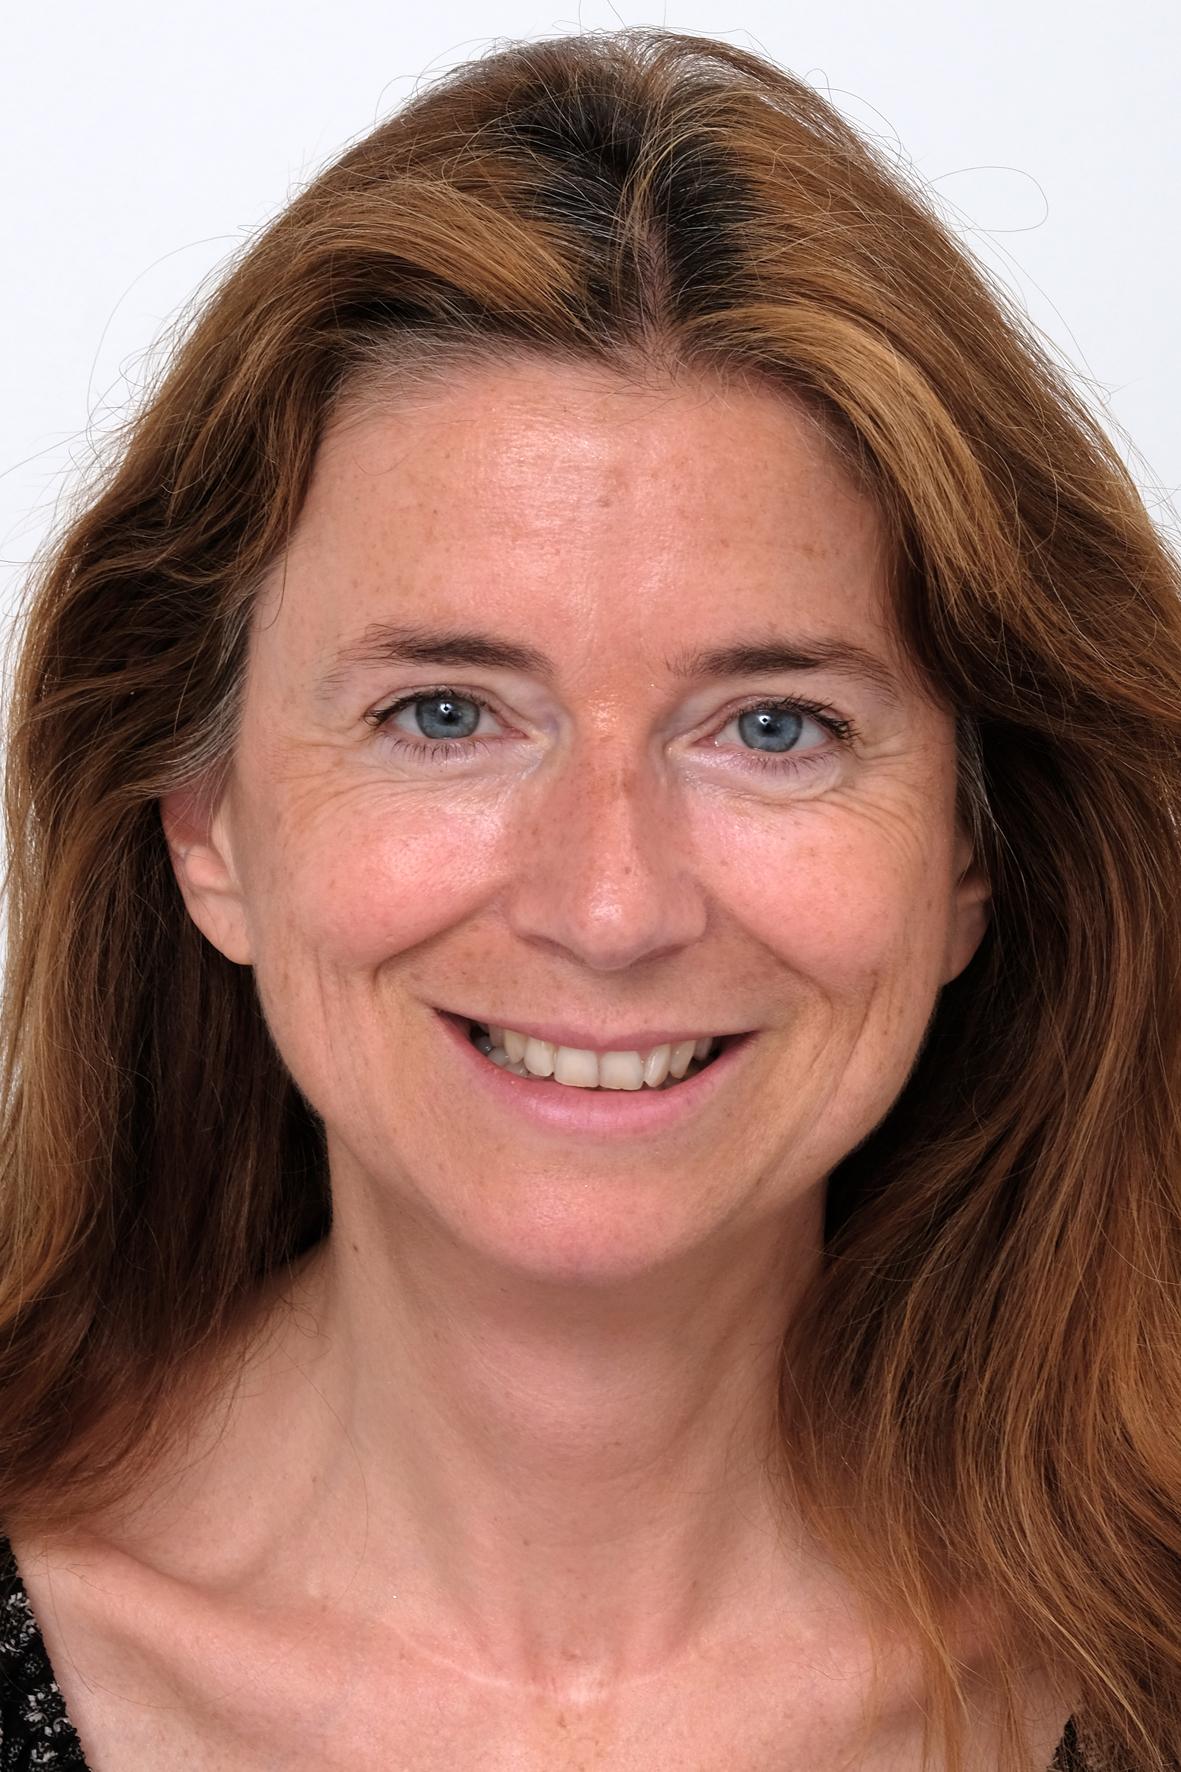 D'URSEL Anne-Charlotte